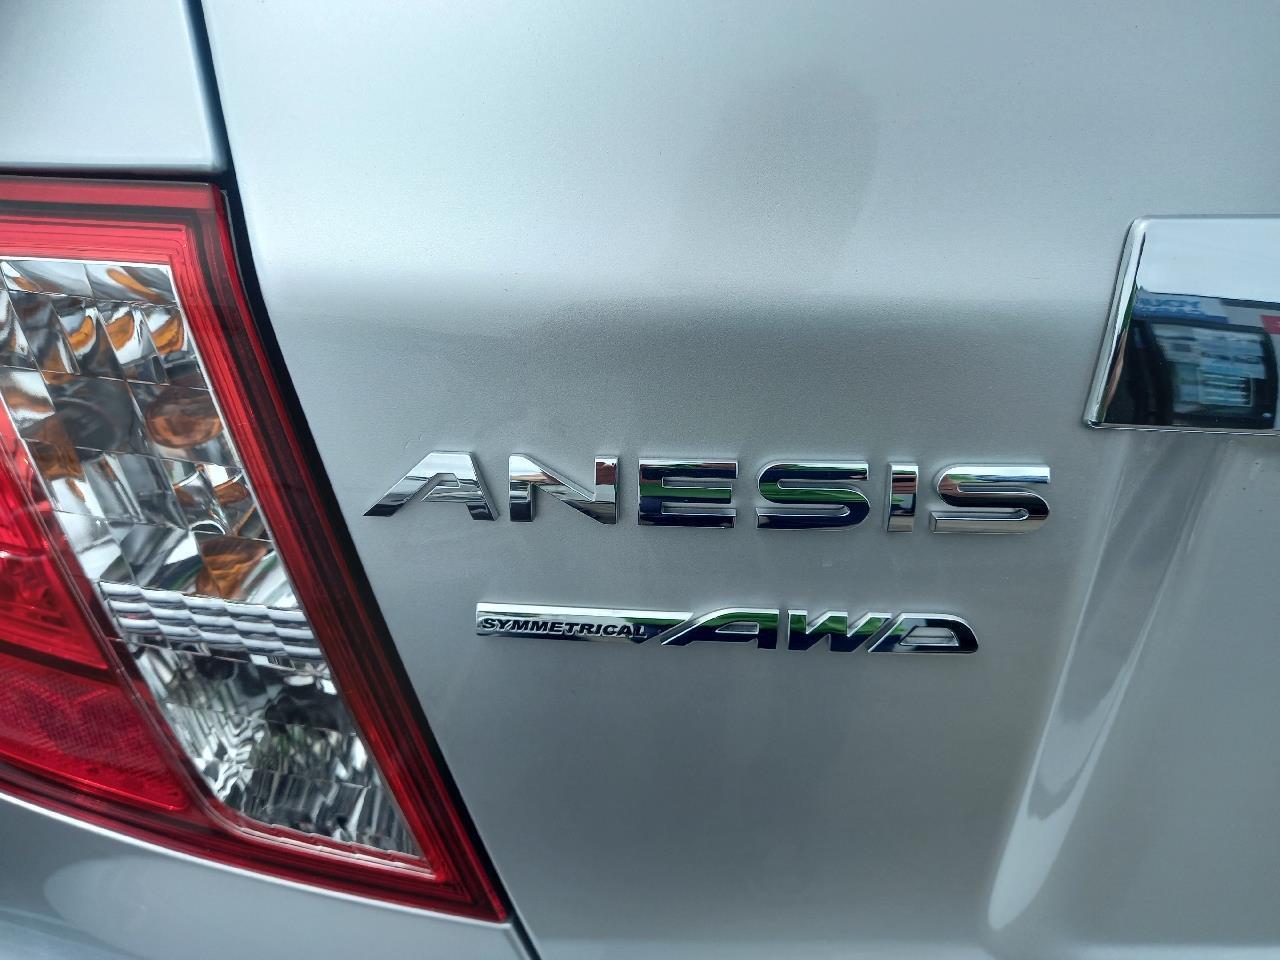 image-7, 2012 Subaru Impreza AWD No Deposit Finance at Dunedin